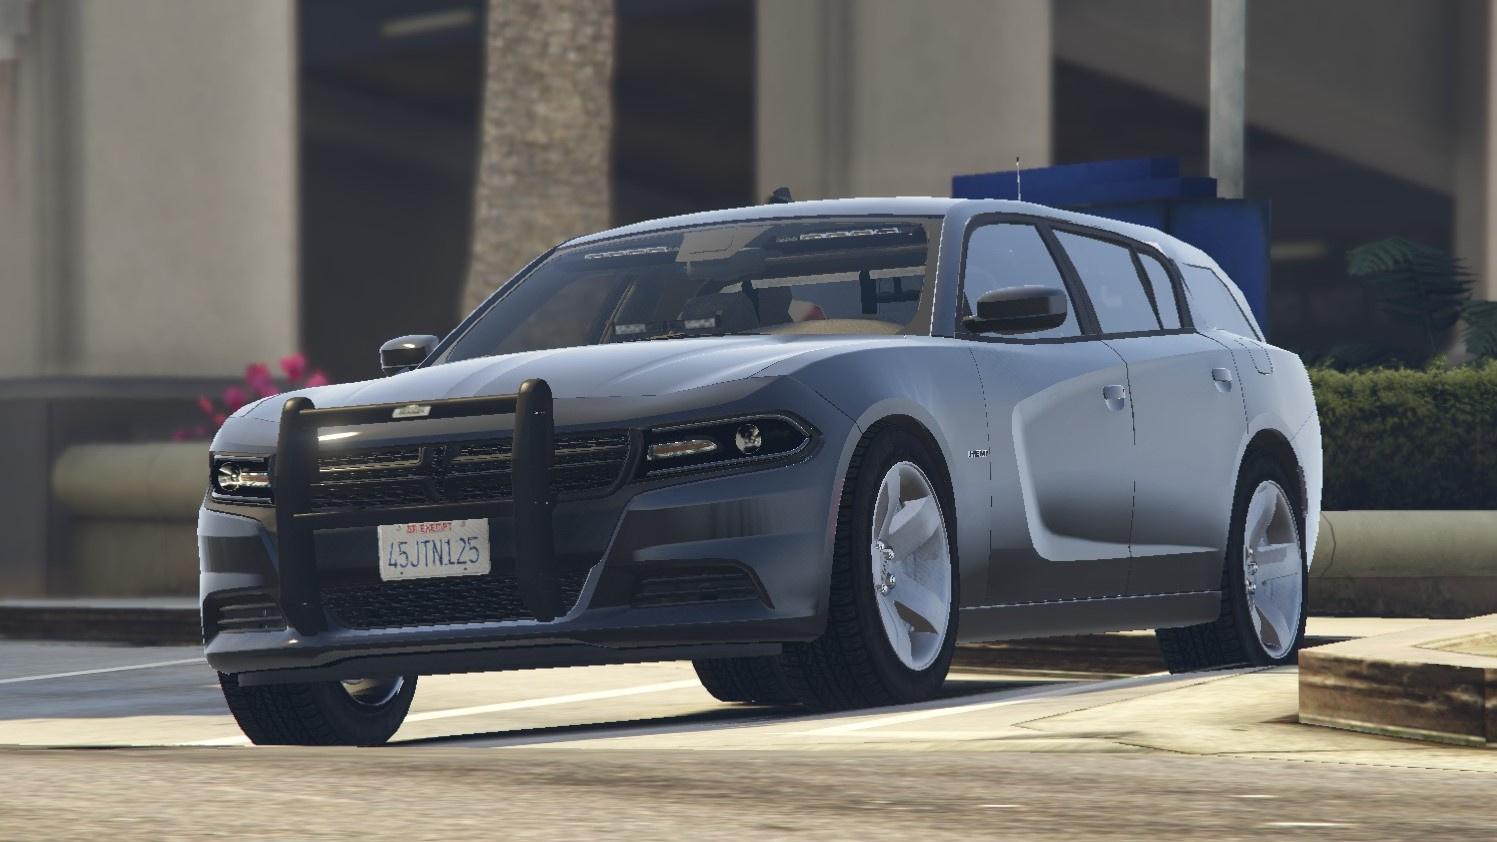 2018 Dodge Magnum >> Els 2018 Dodge Magnum Gta5 Mods Com